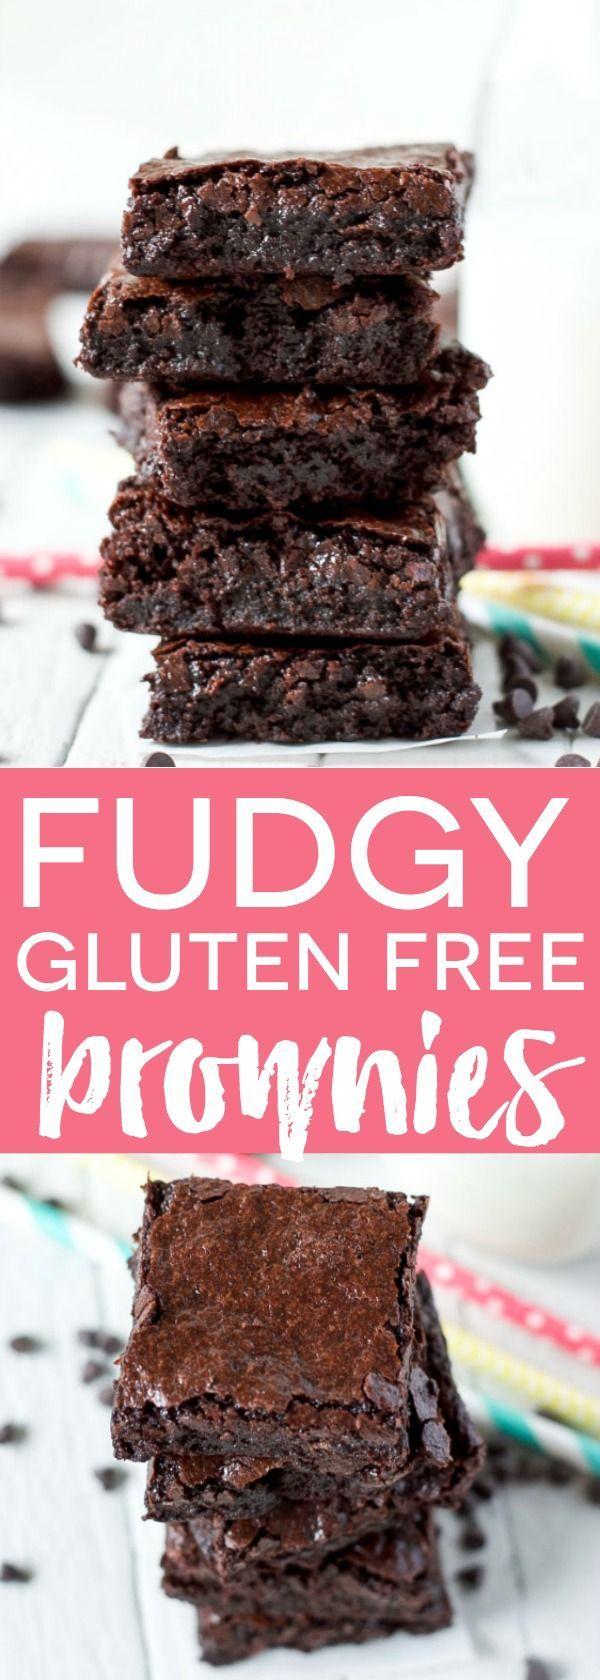 Super Fudgy Gluten Free Brownies (a Ghirardelli copycat recipe) from /whattheforkblog/   http://whattheforkfoodblog.com